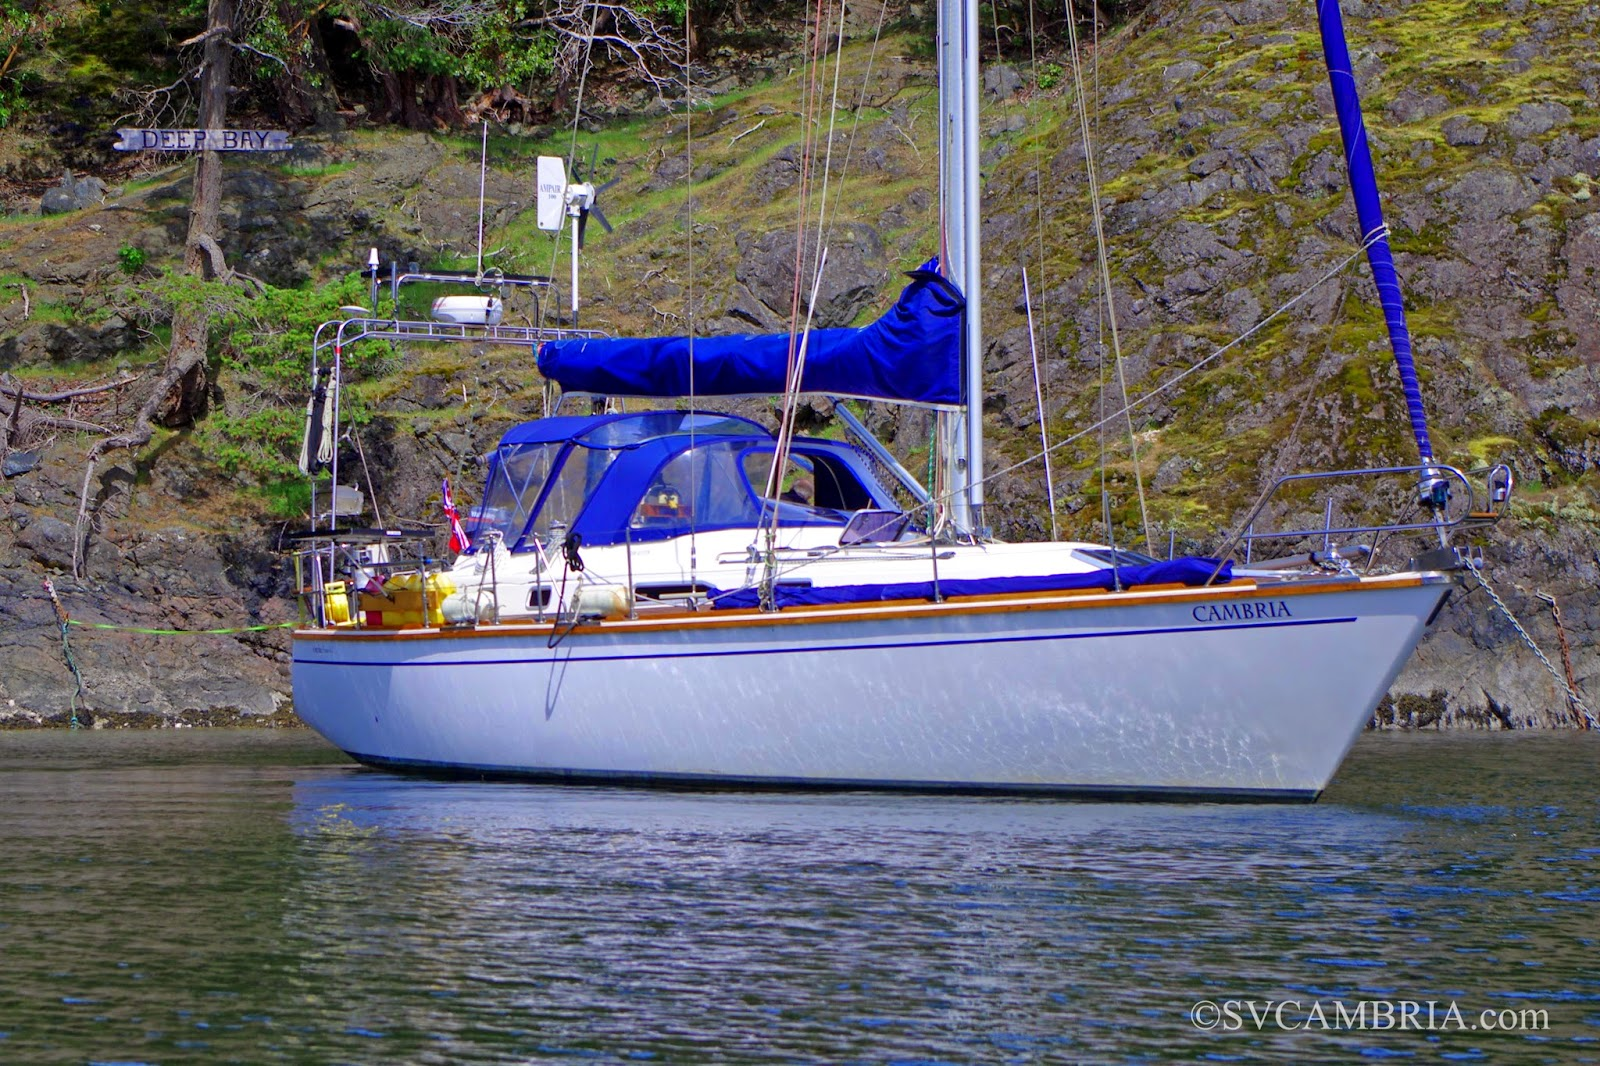 Cambria at anchor in Deep Bay, Jedediah Island, BC.